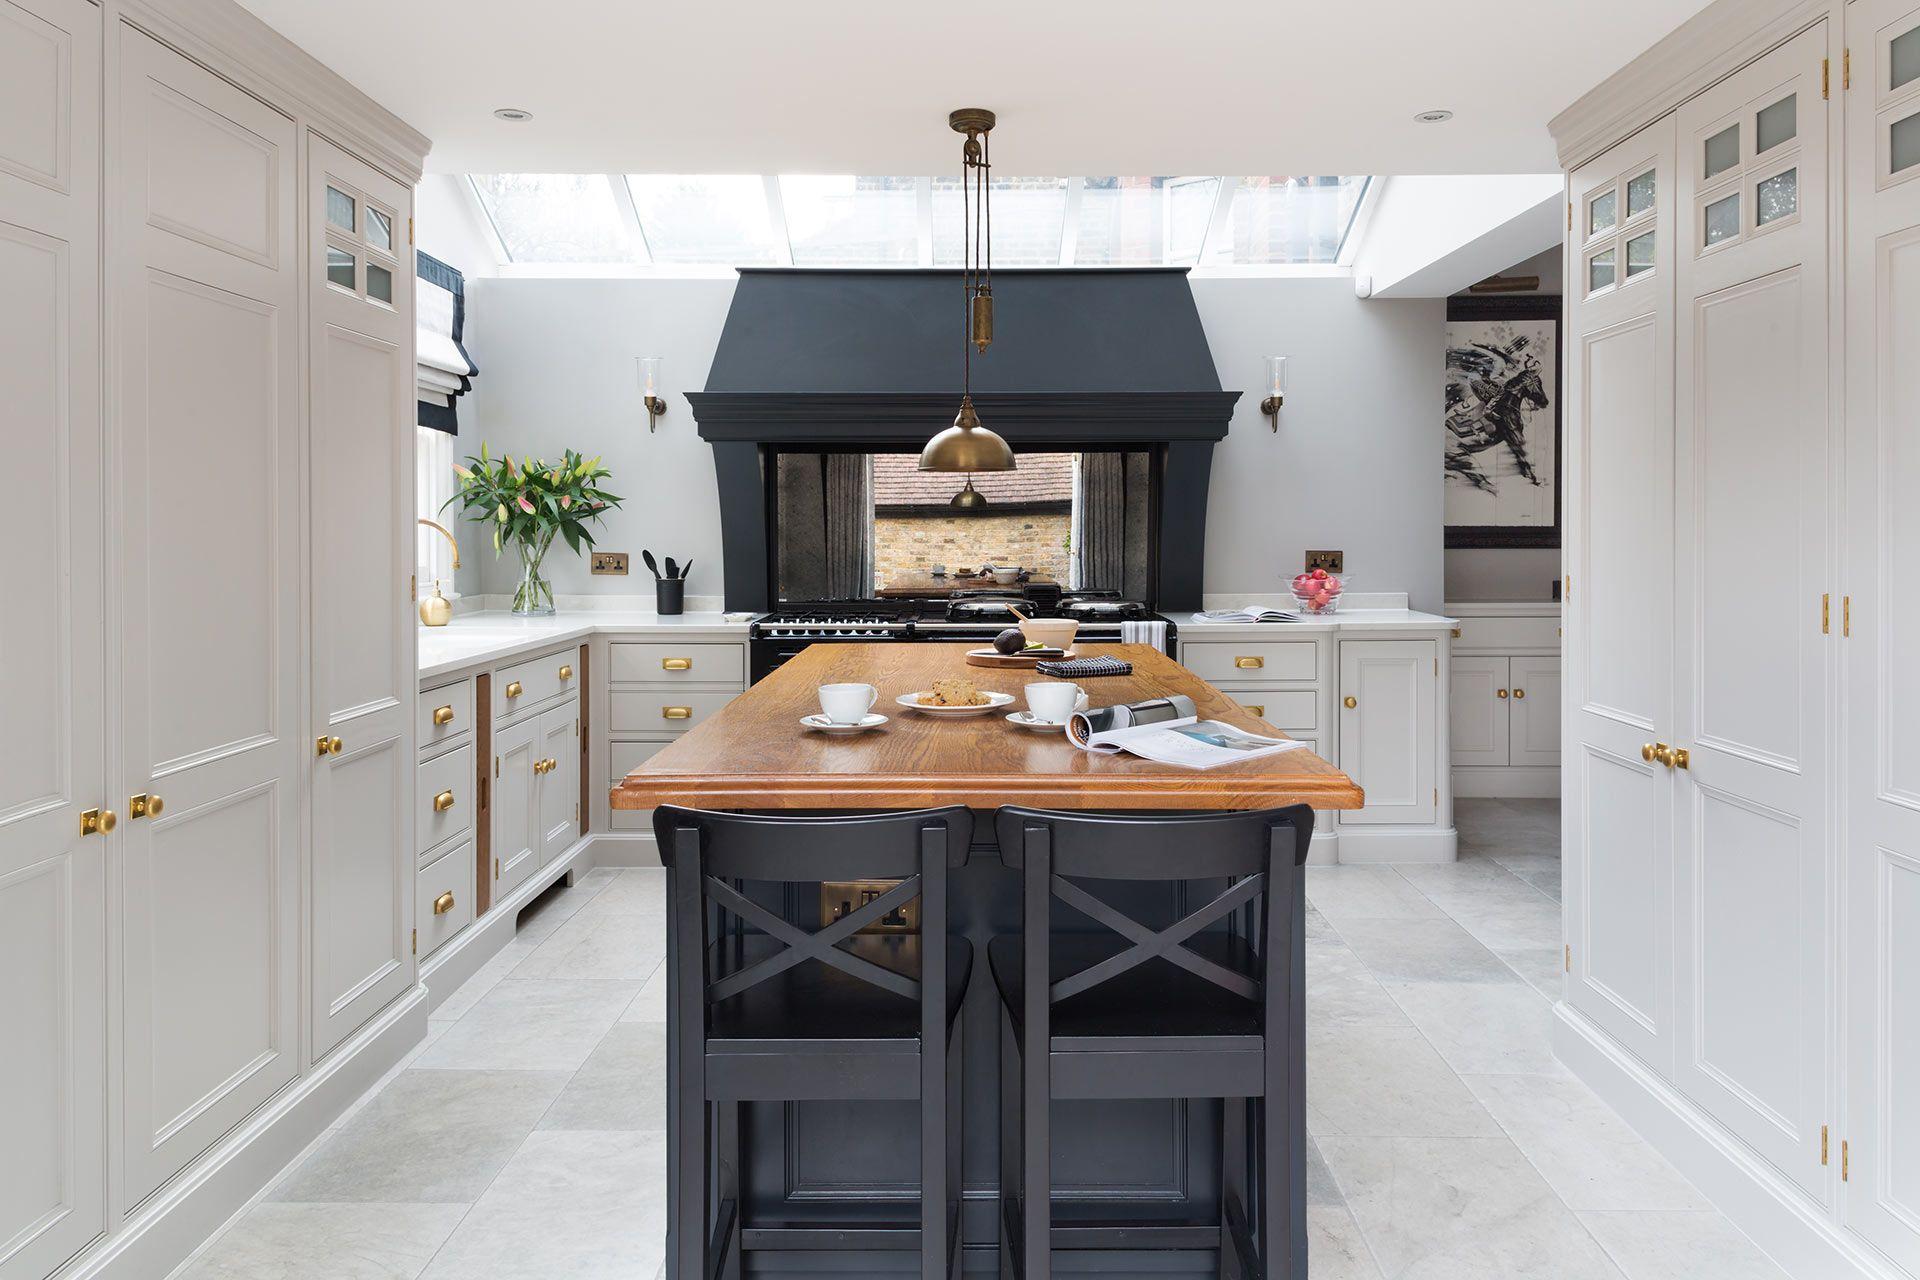 Blackheath Kitchen Project - Humphrey Munson | Josh | Pinterest